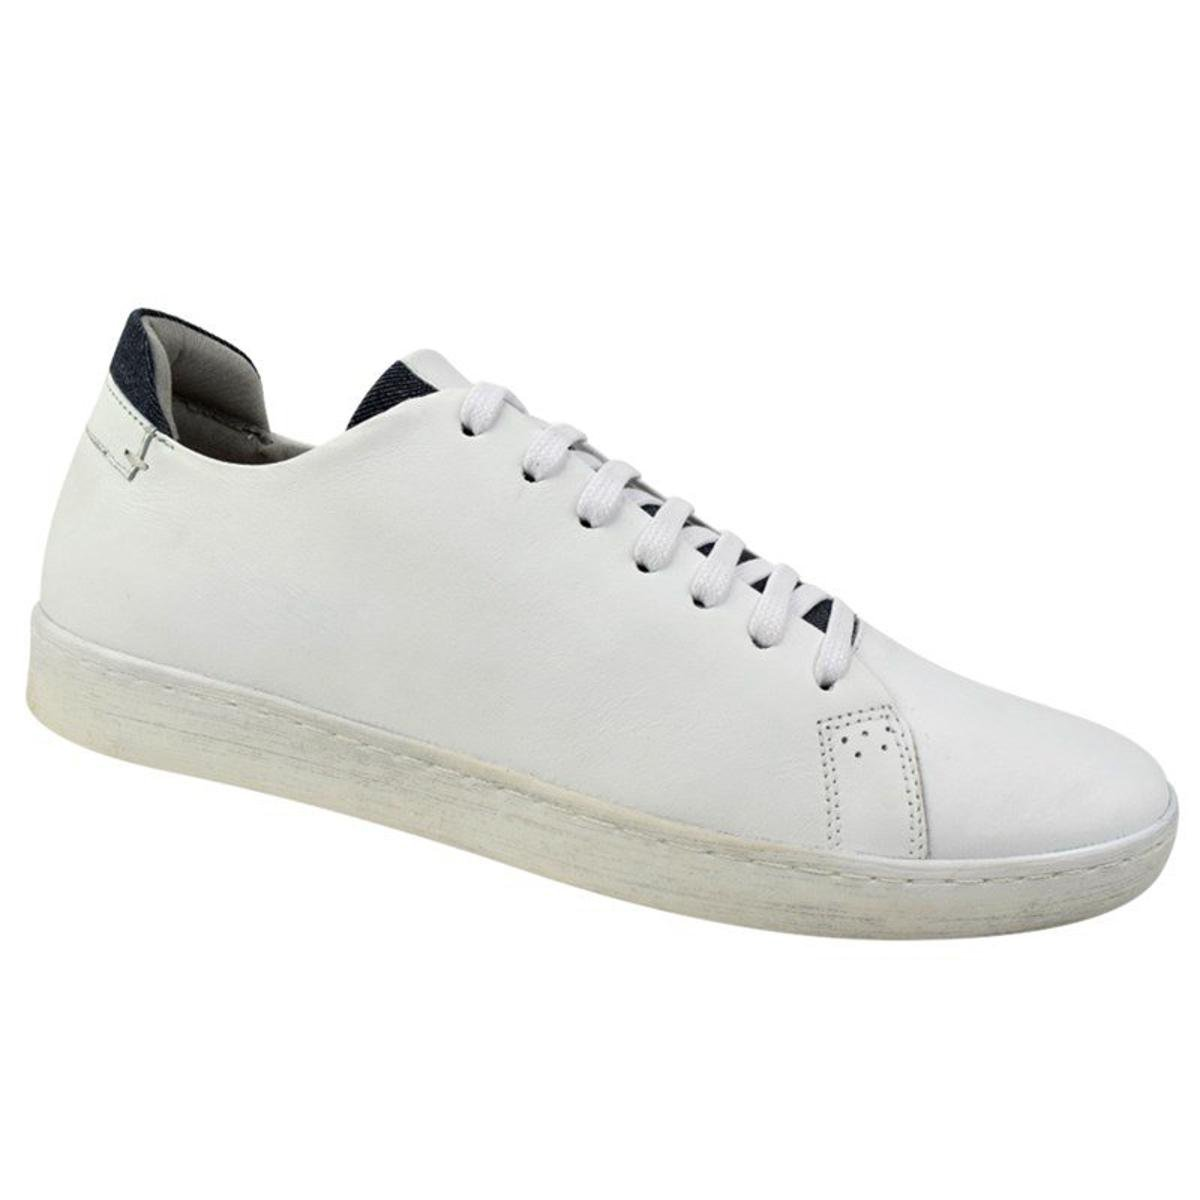 df7e474349f Sapatênis Constantino Masculino - Branco - Compre Agora